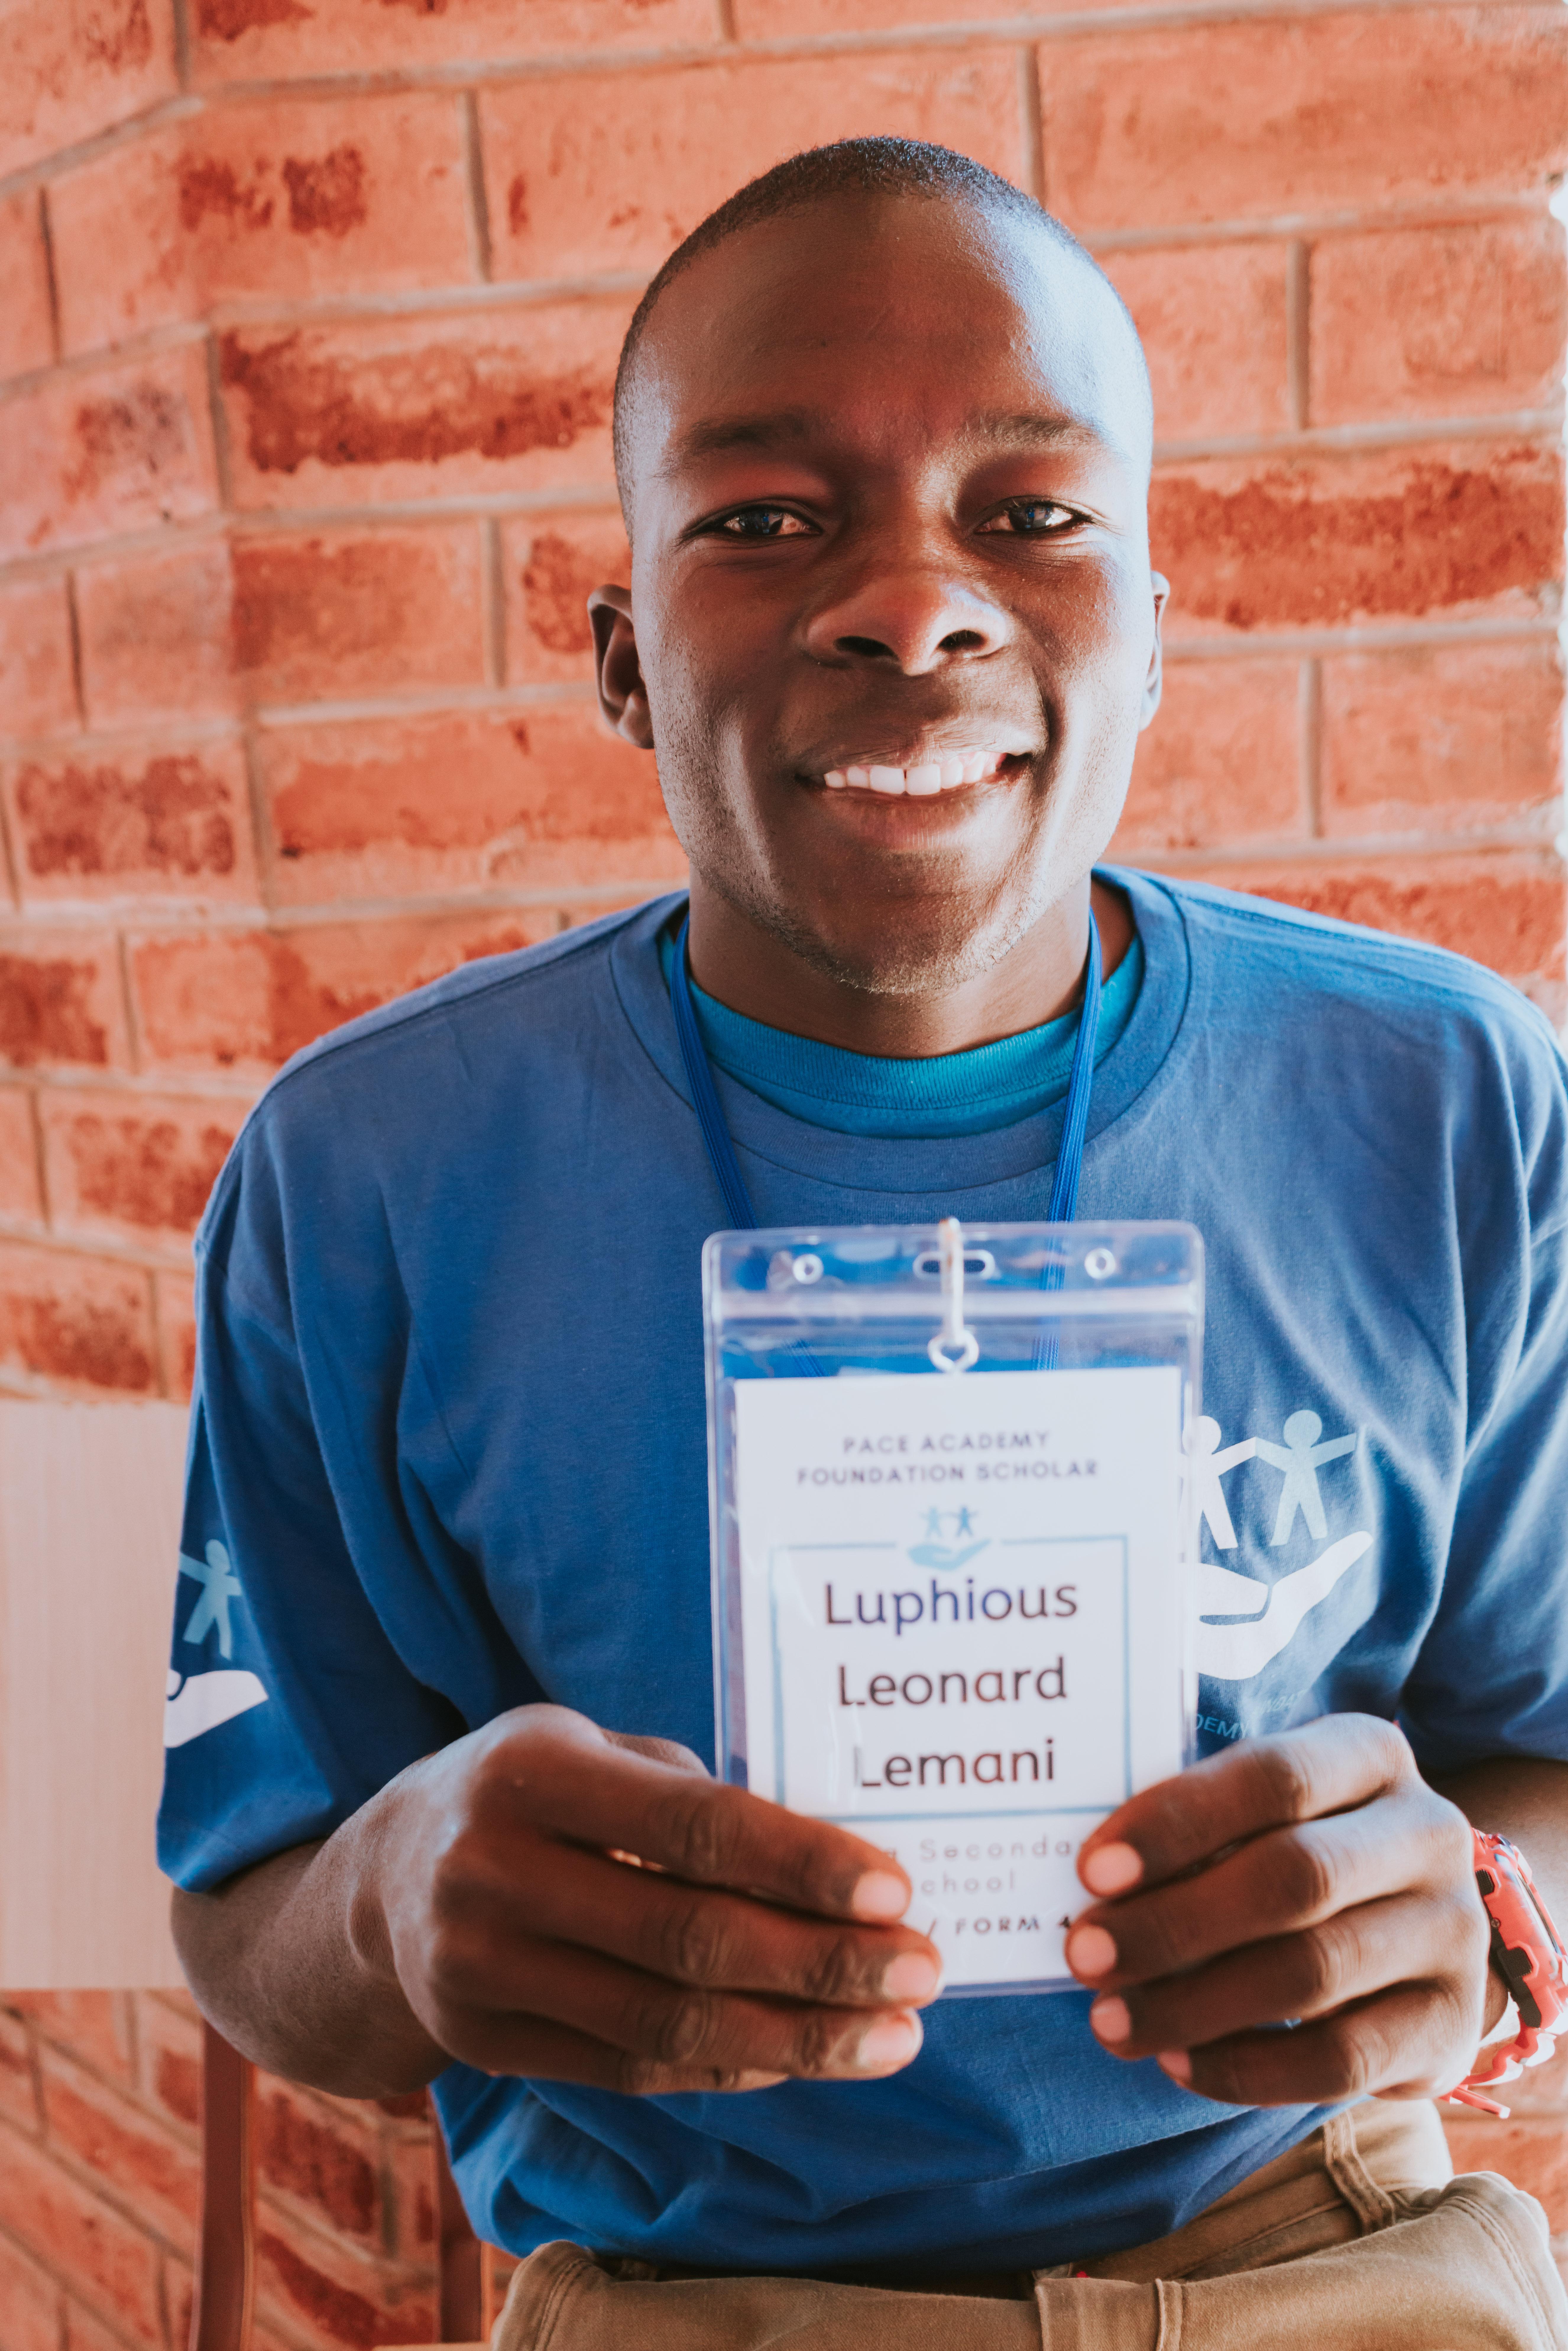 Luphious Leonard Lemani (Dowa Secondary